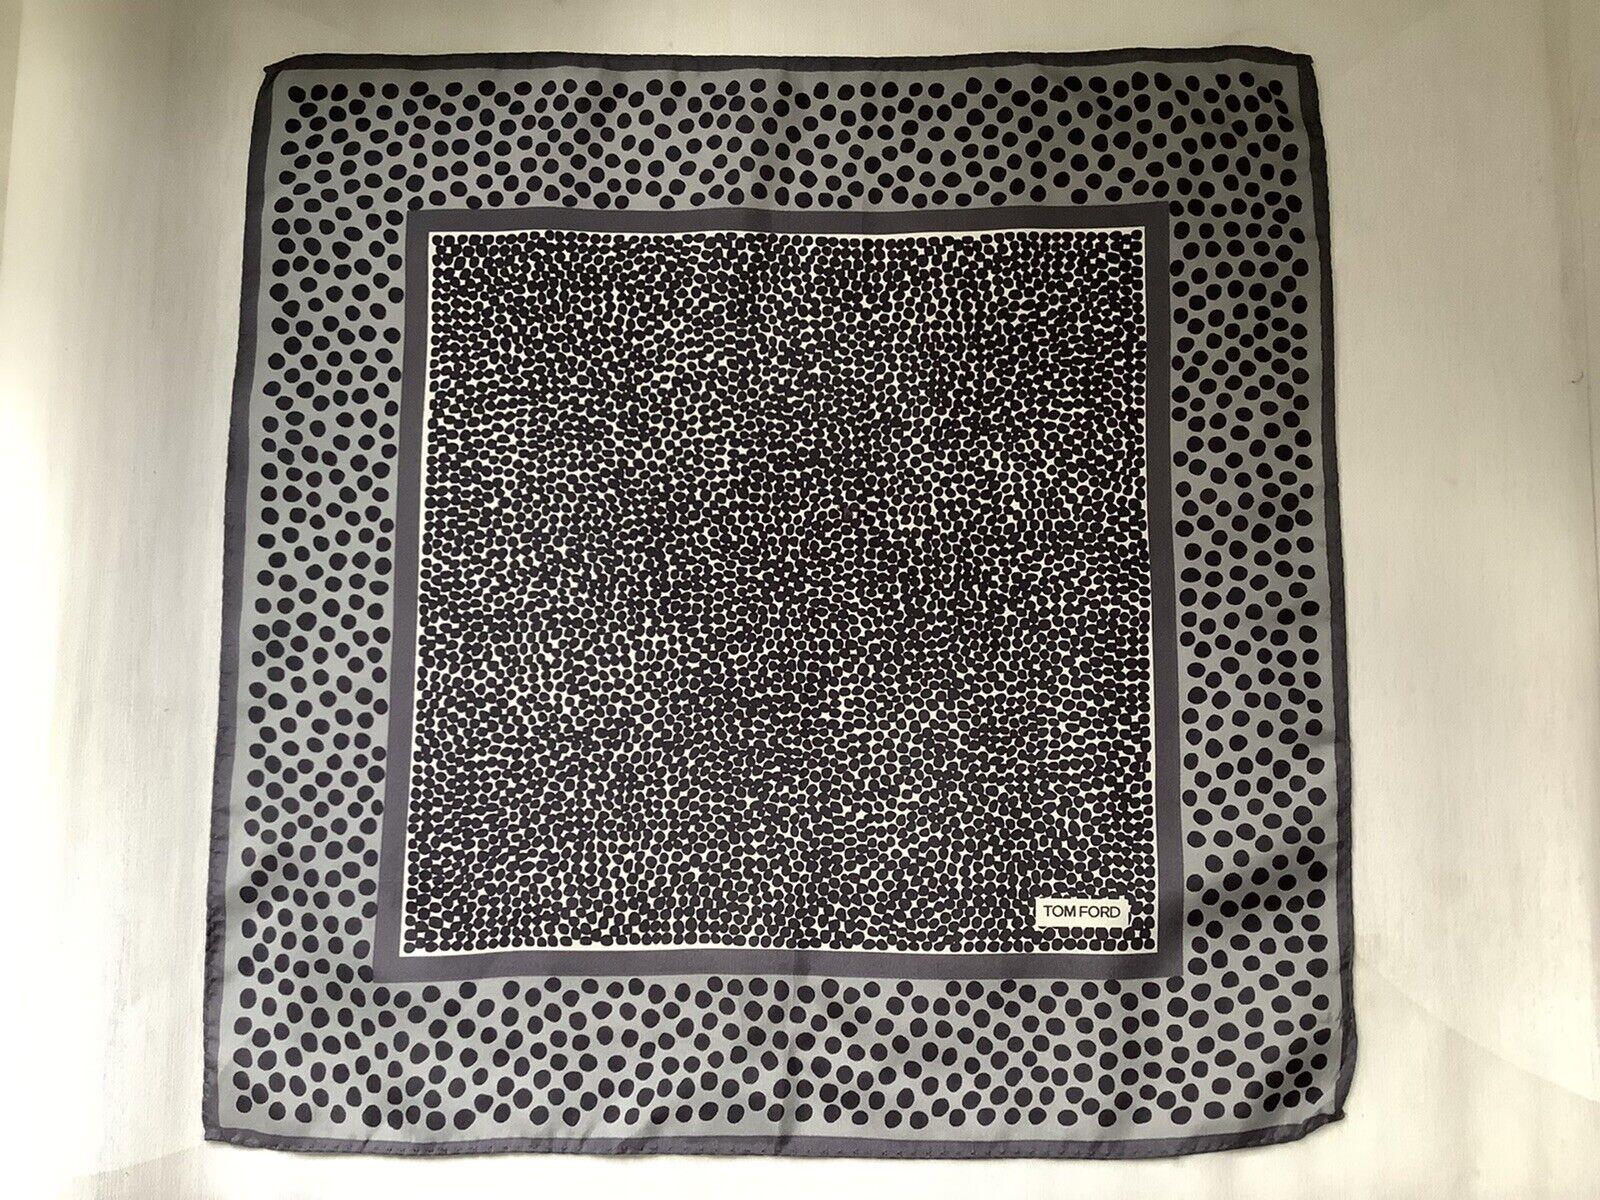 Tom Ford Handkerchief 100% Silk Made In Italy